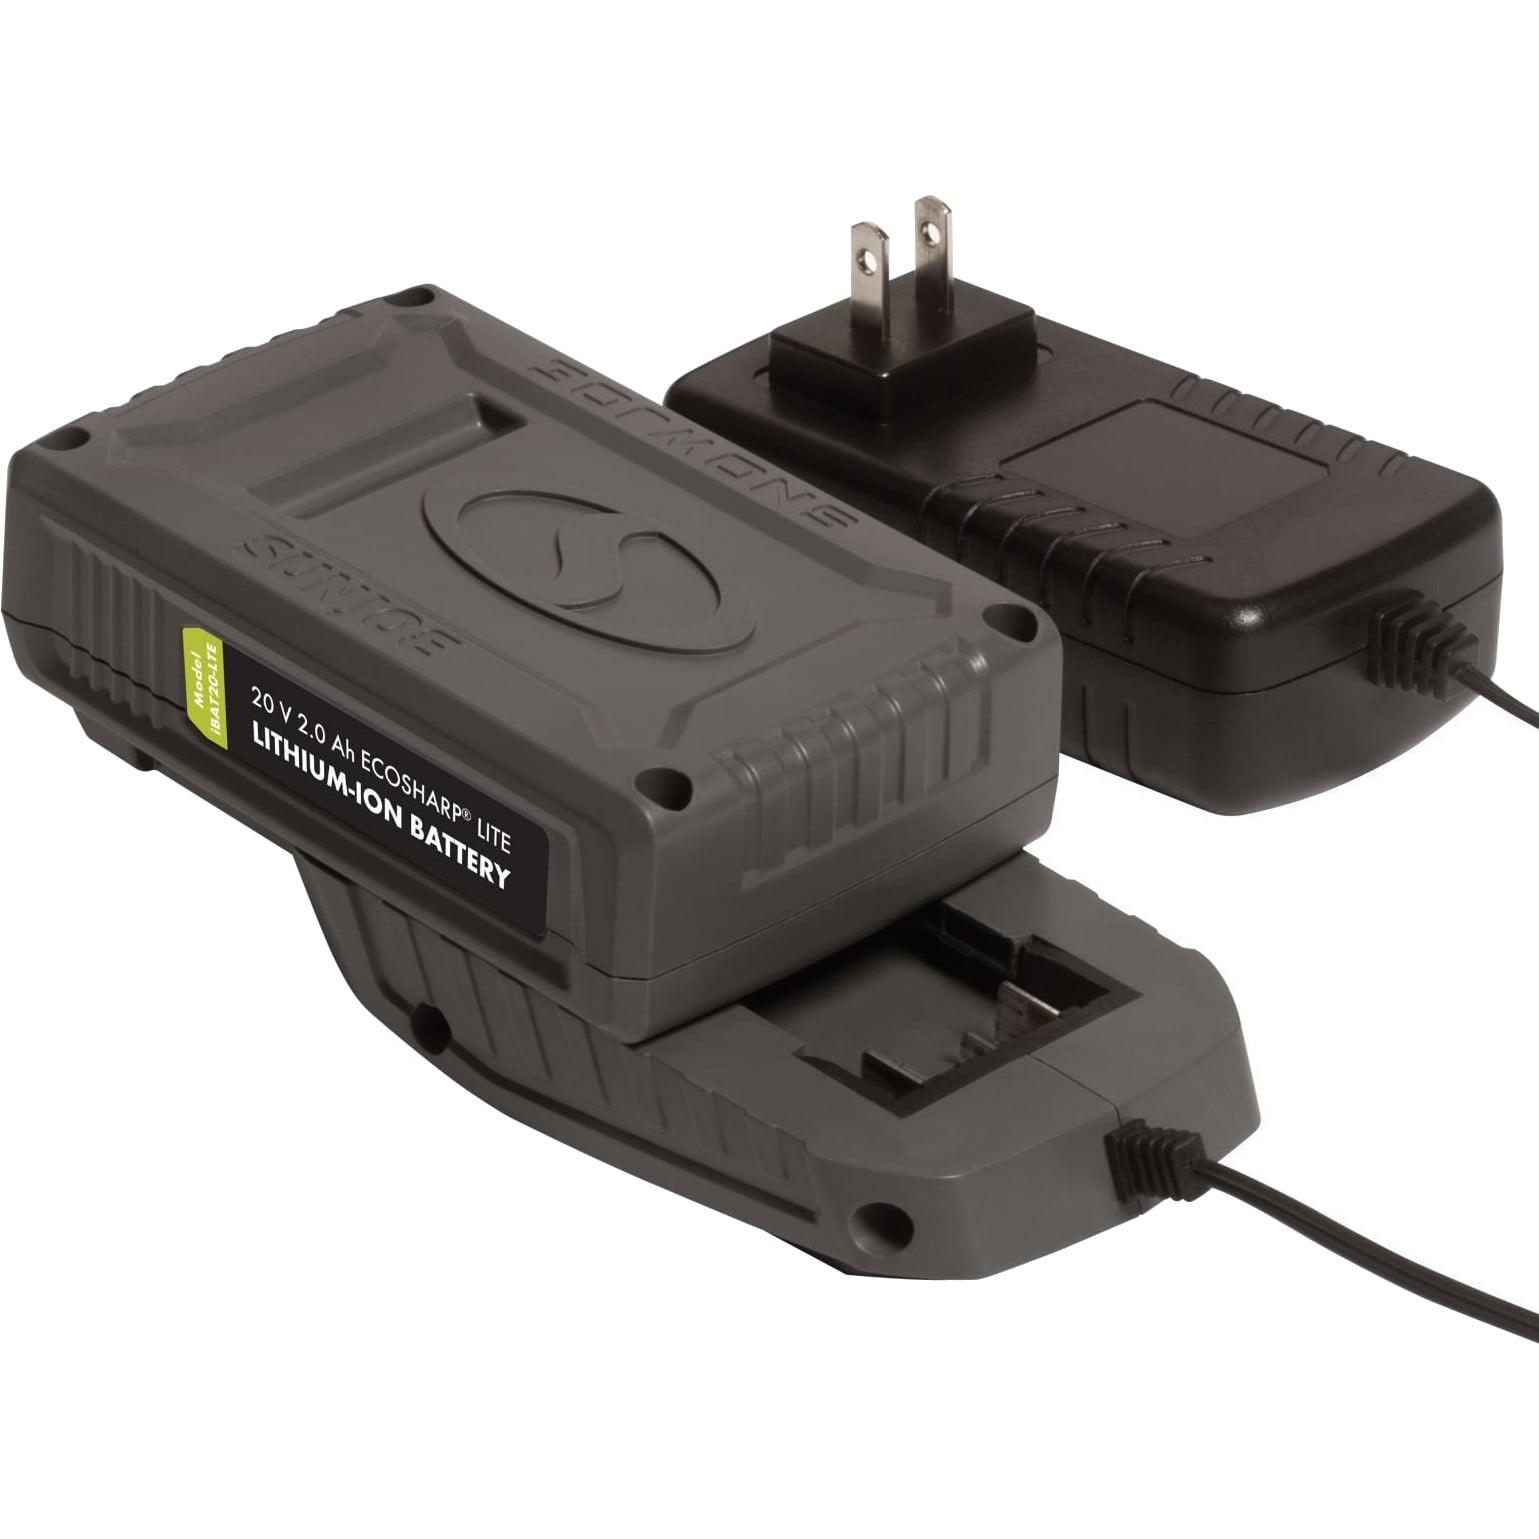 Snow Joe iCHRG20 EcoSharp Lithium-Ion Battery Charger | 20 Volt